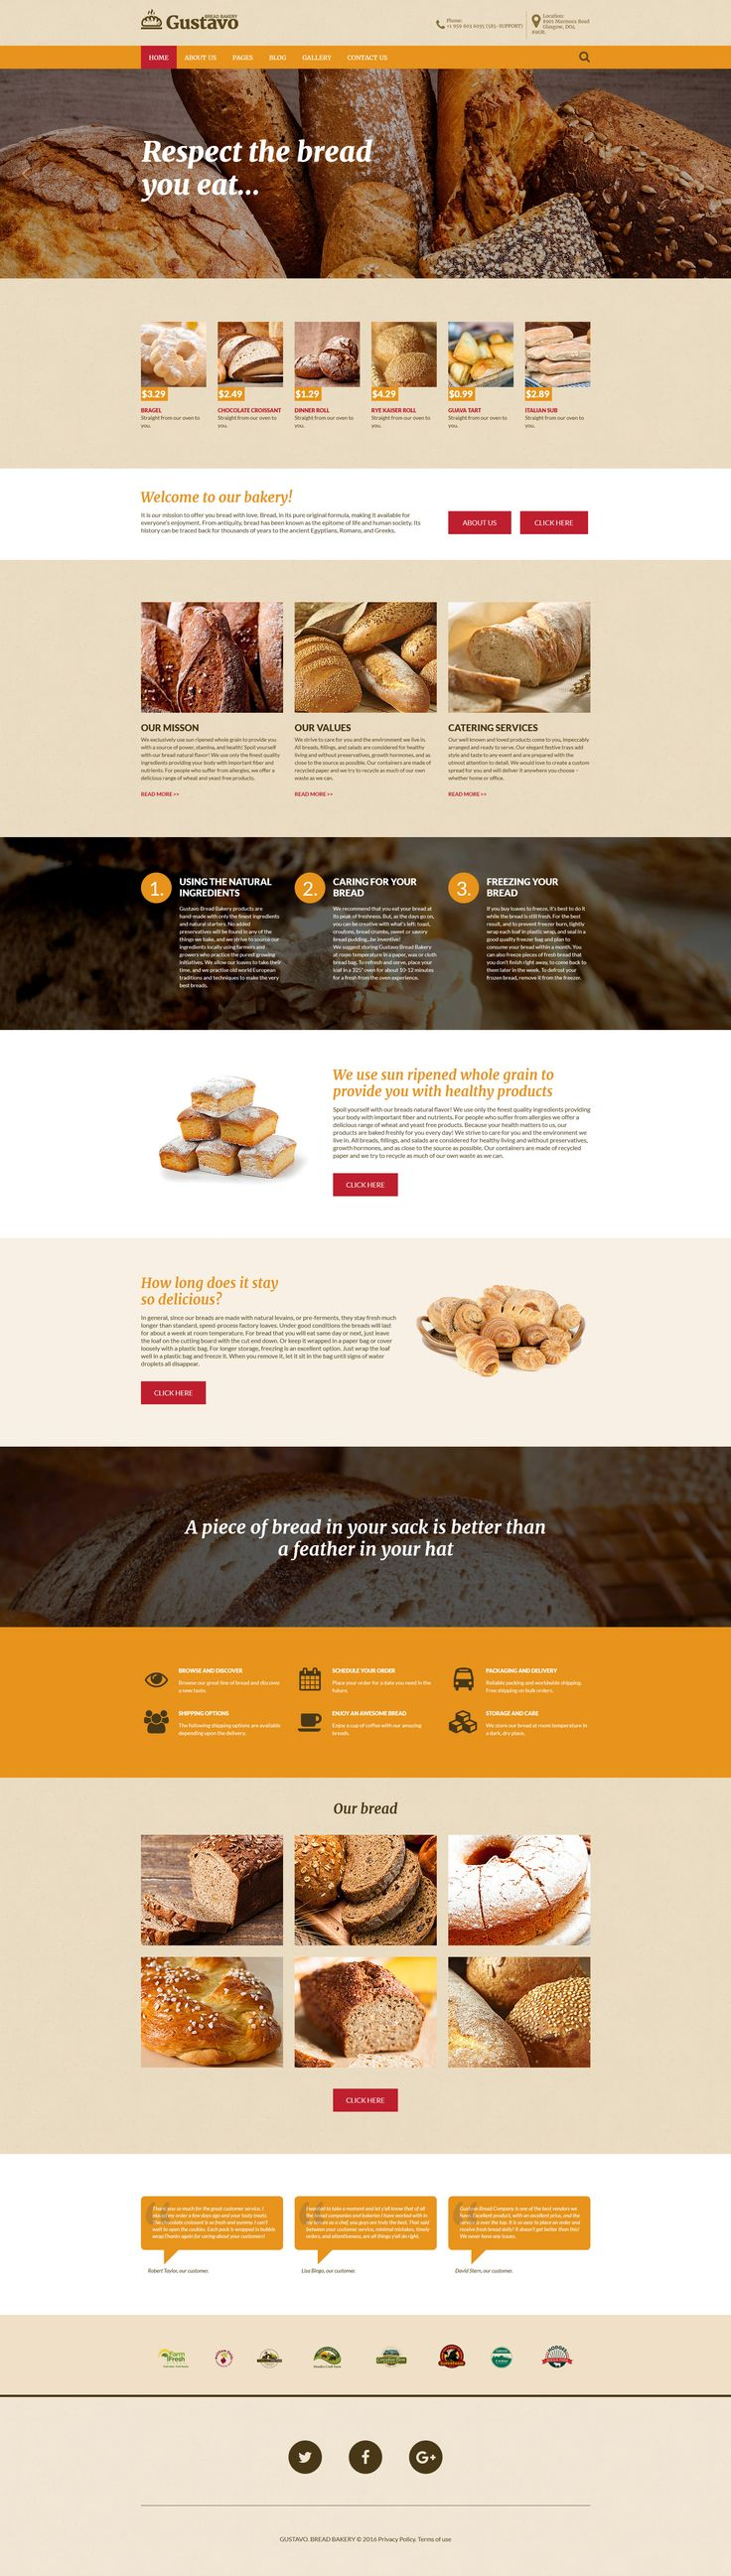 292 best joomla templates images on pinterest bakery responsive joomla template pronofoot35fo Choice Image